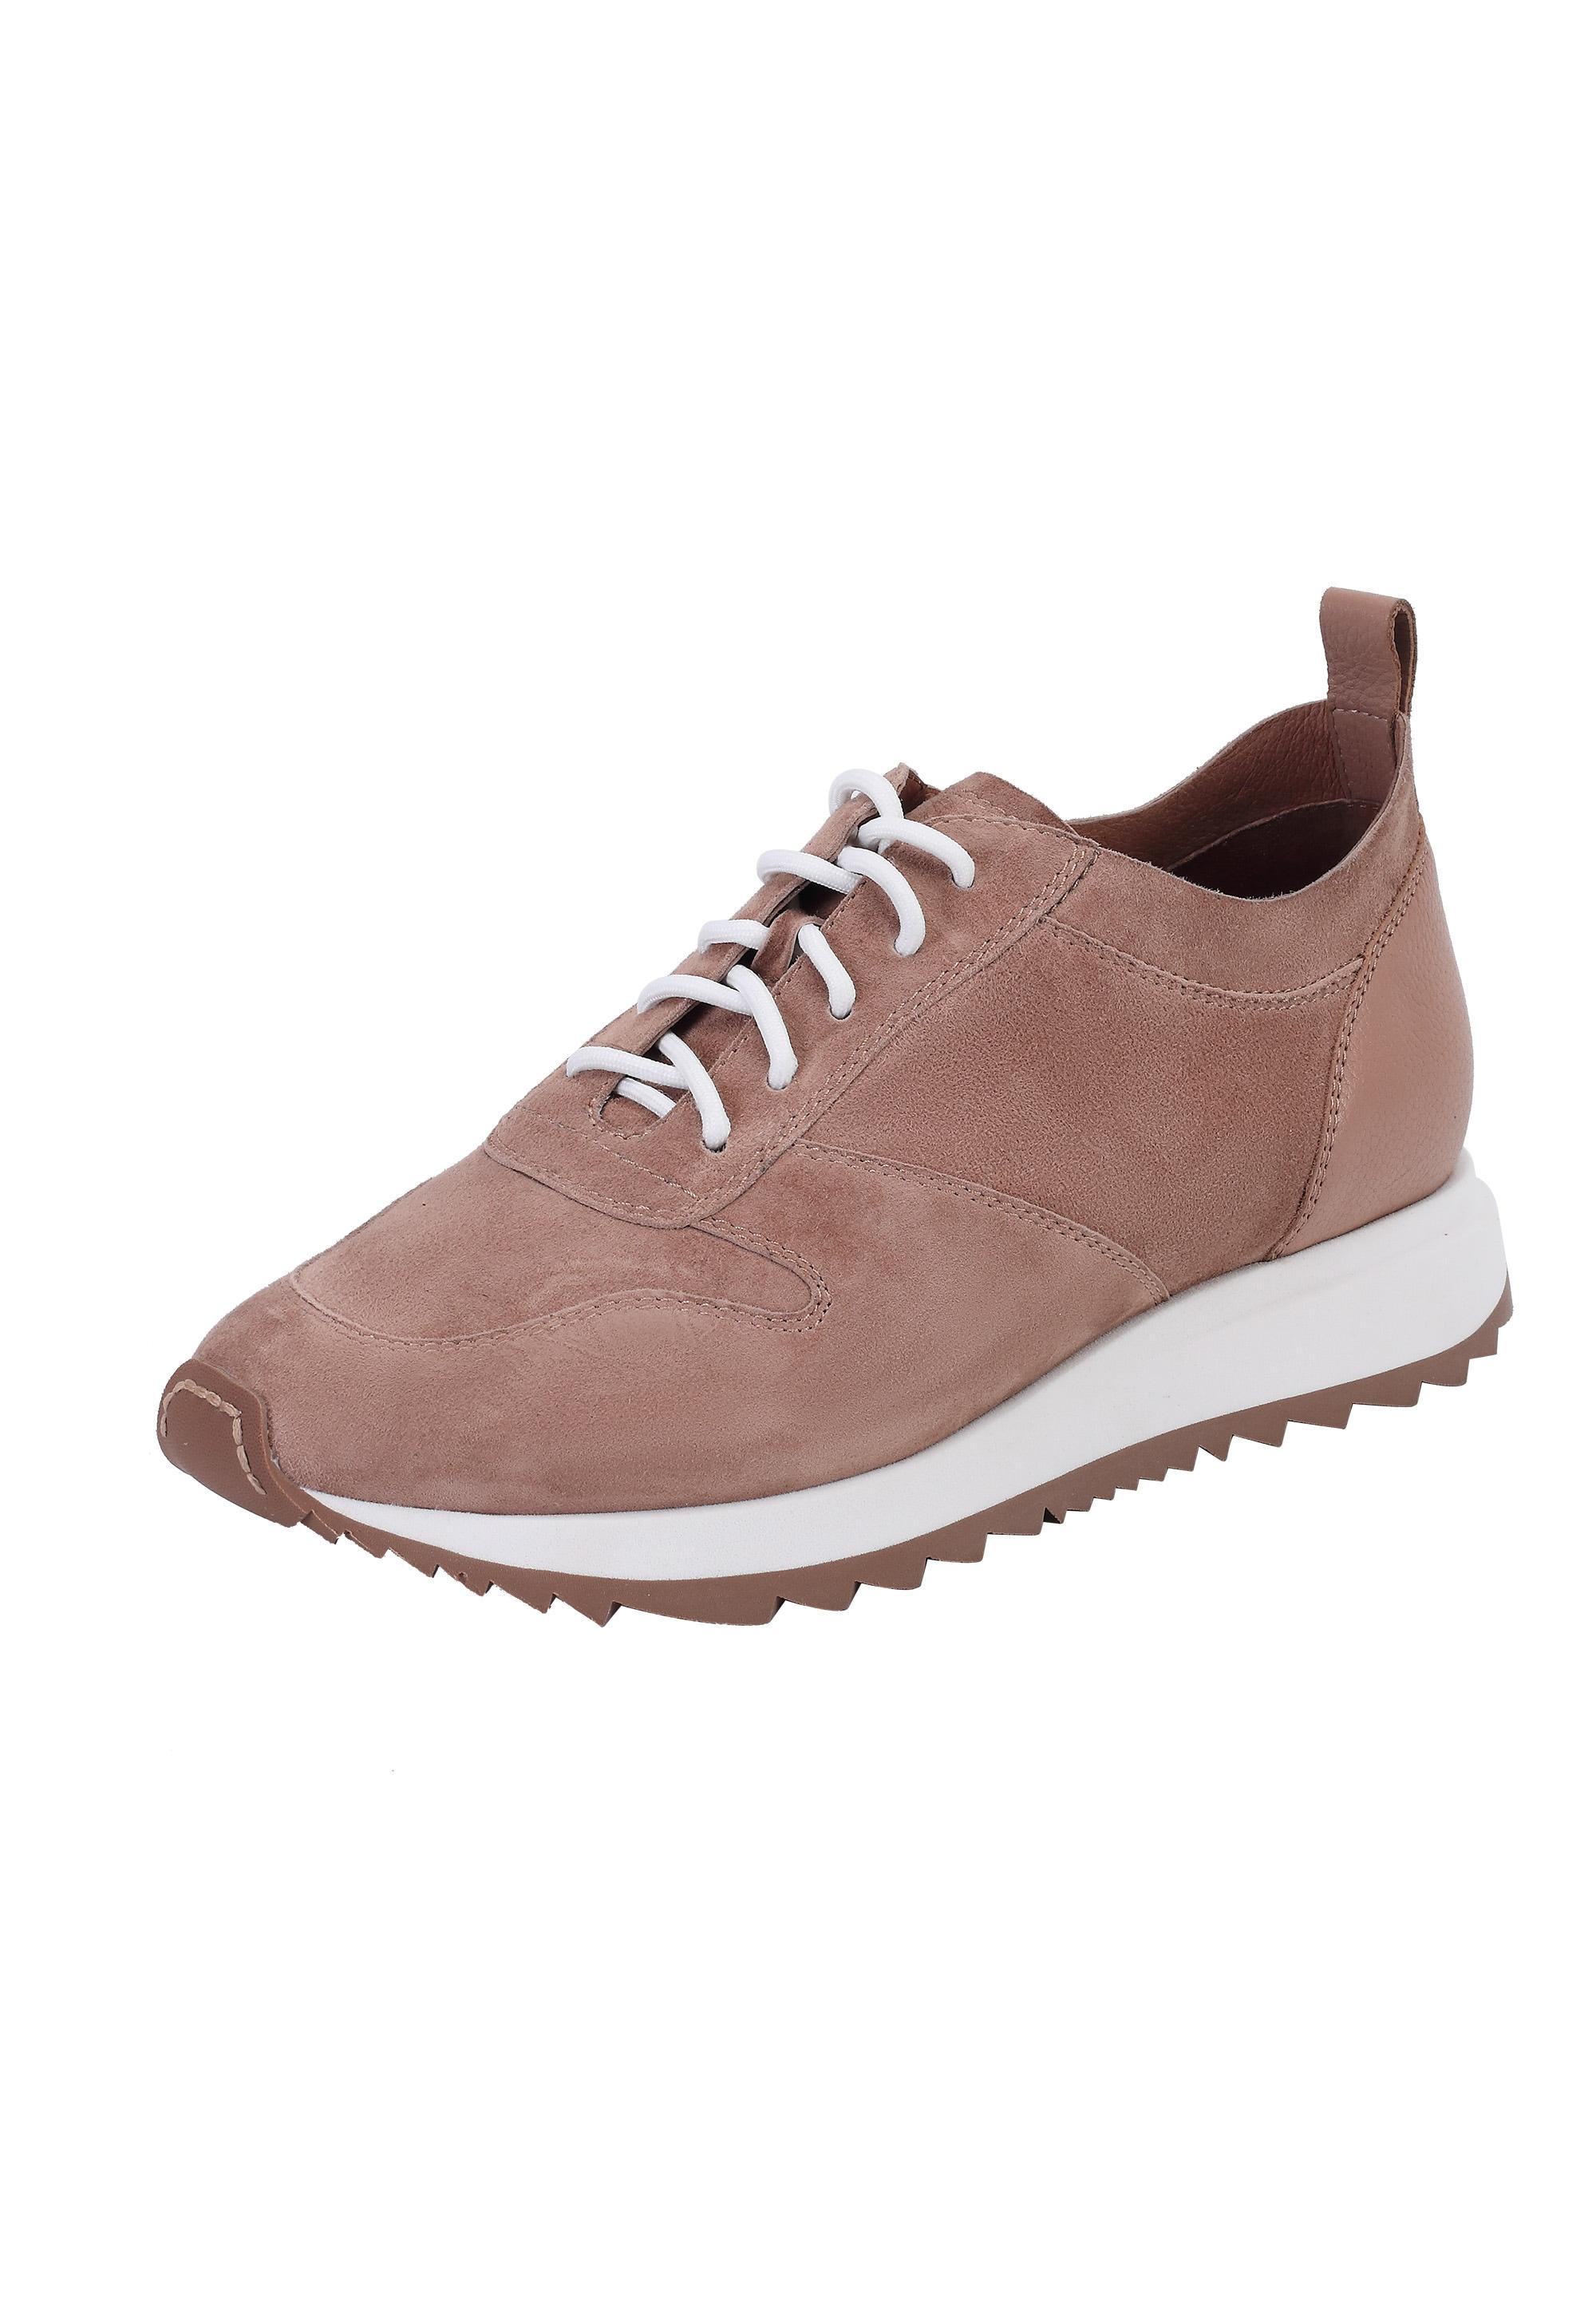 ekonika -  Sneaker, mit trendiger Kontrastsohle